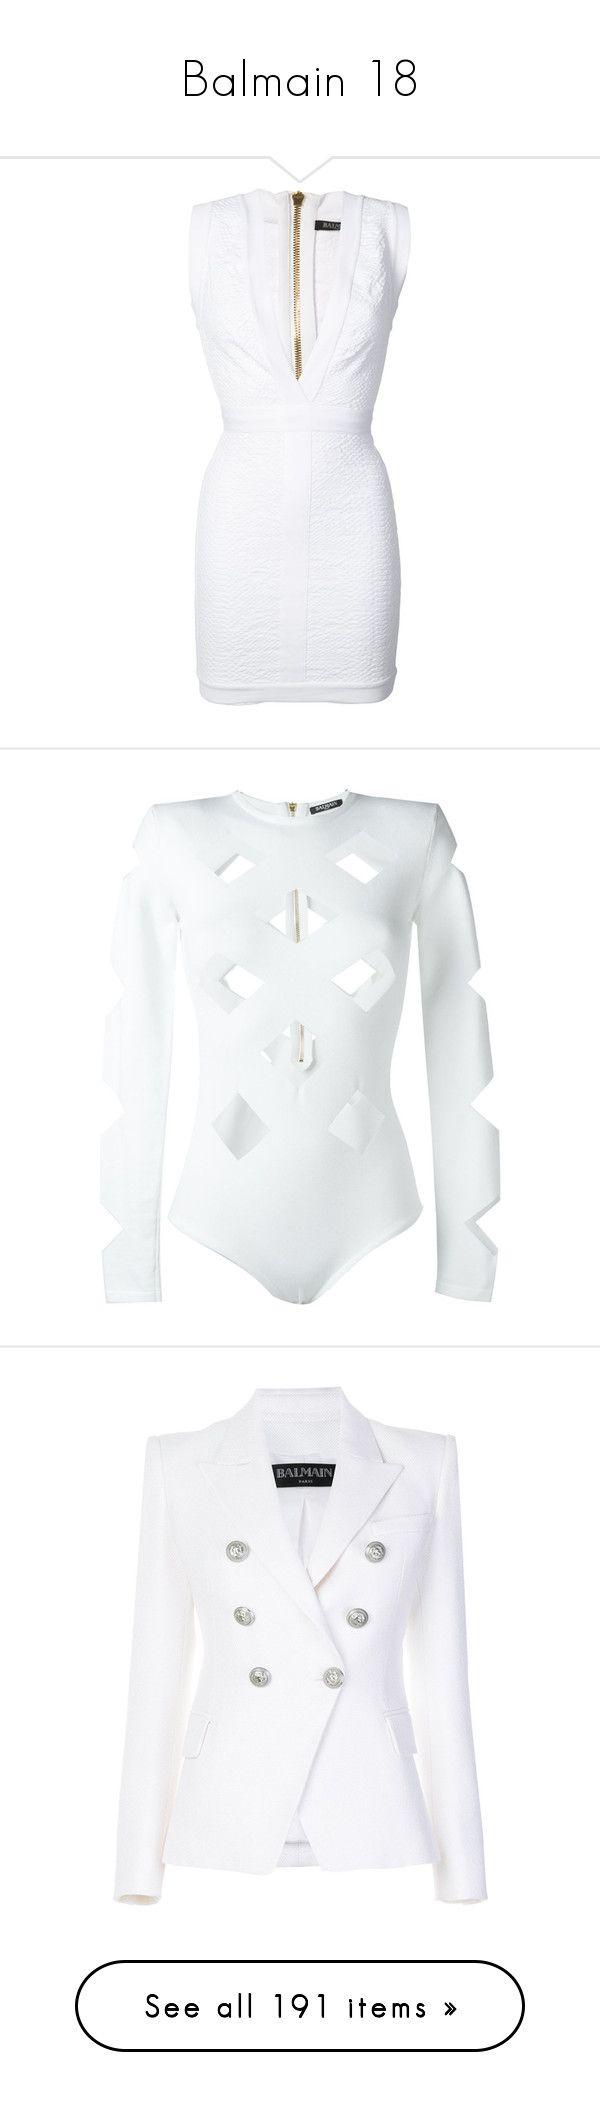 """Balmain 18"" by alyssa23 on Polyvore featuring dresses, balmain, white, v neck dress, v neck short dress, short dresses, low v neck dress, summer dresses, intimates and shapewear"